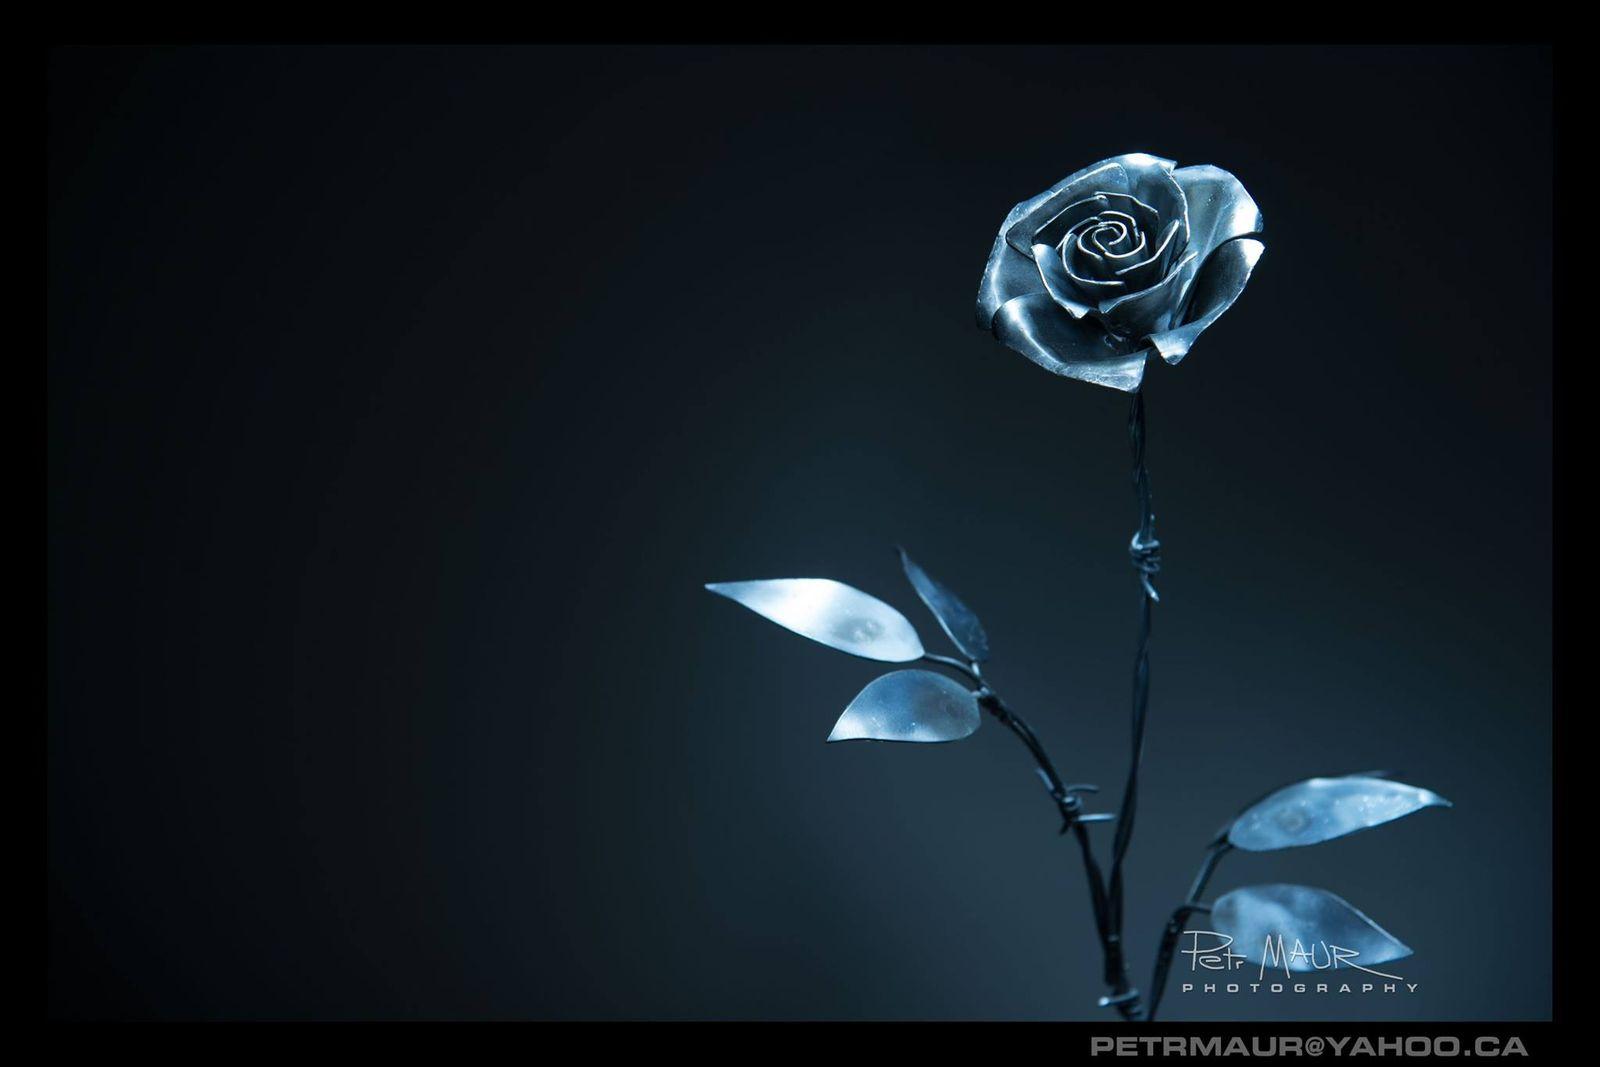 Rose ___ - by Petr Maur